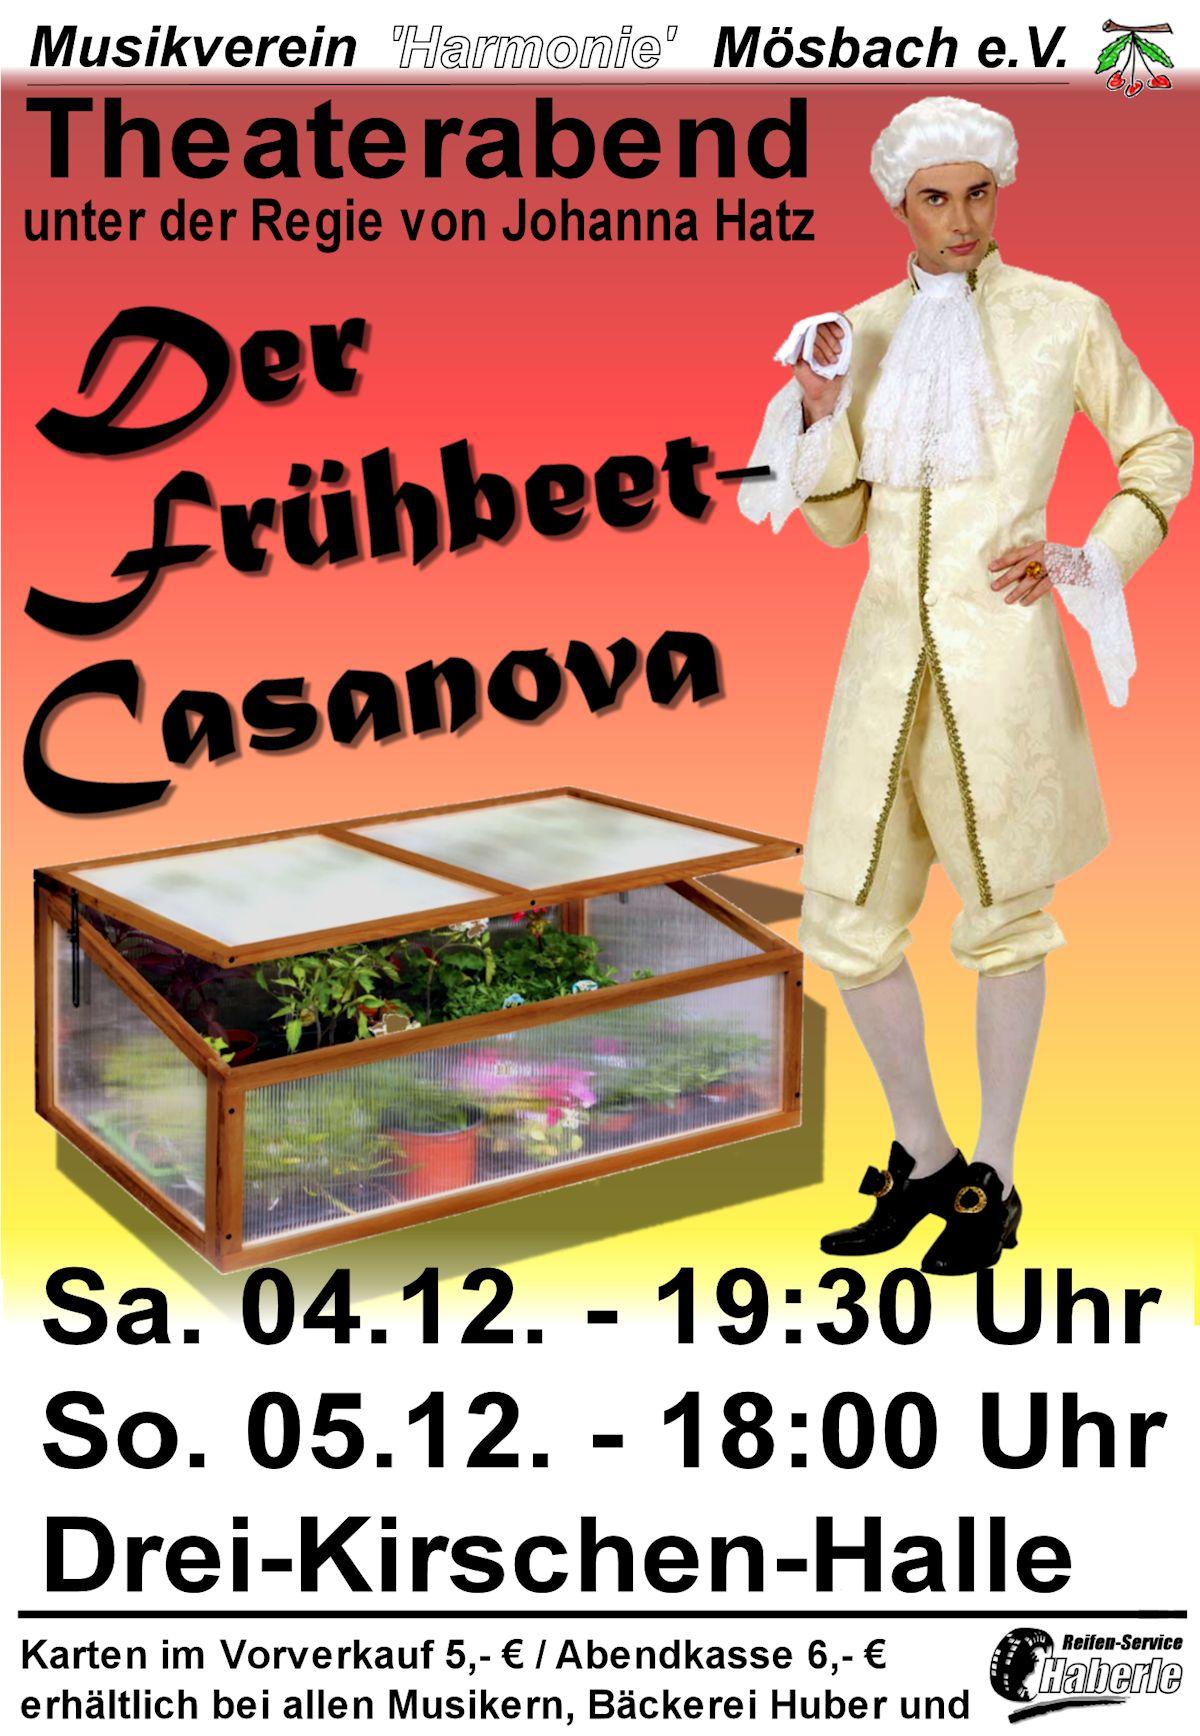 2010 THE Plakat